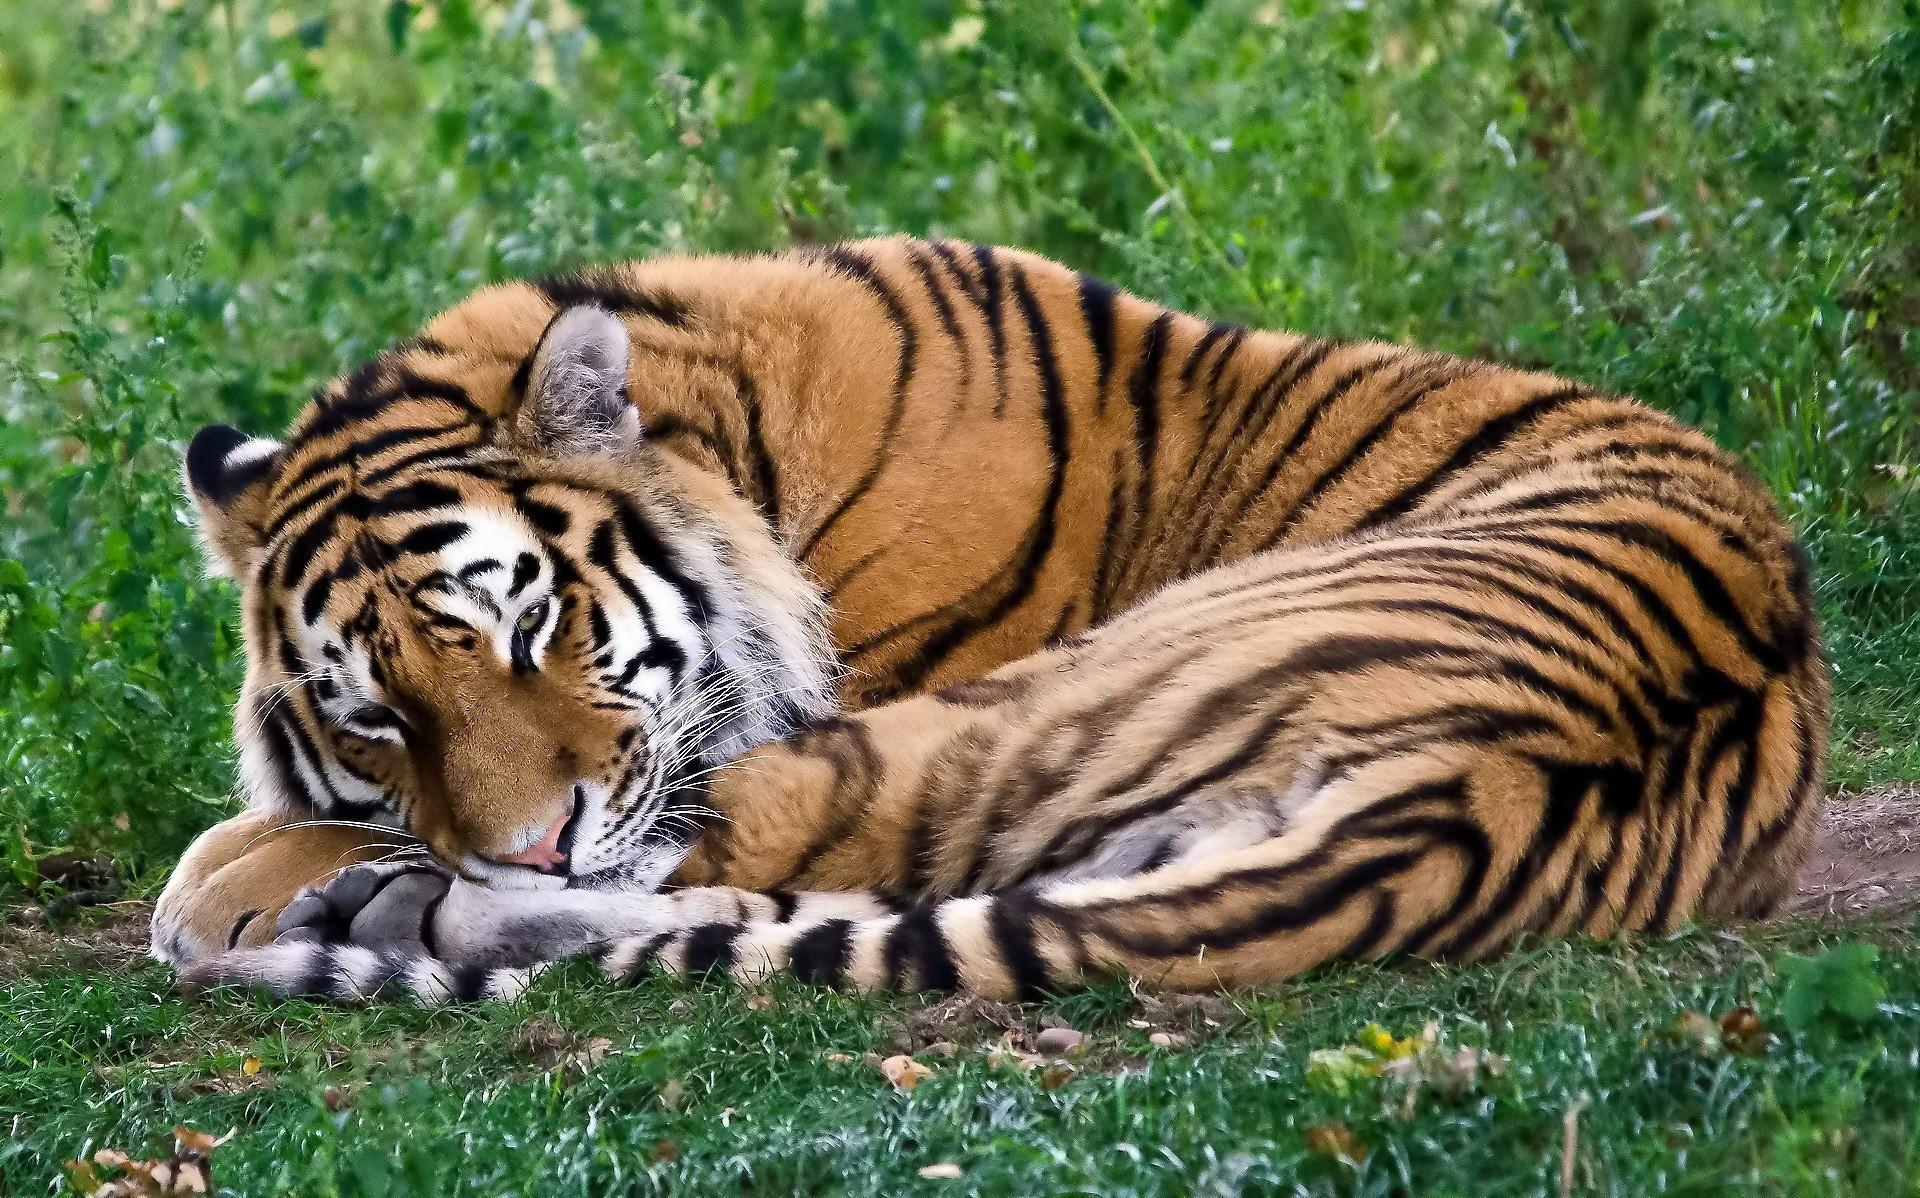 Sleeping Tiger Wallpaper HD 19530 - Baltana